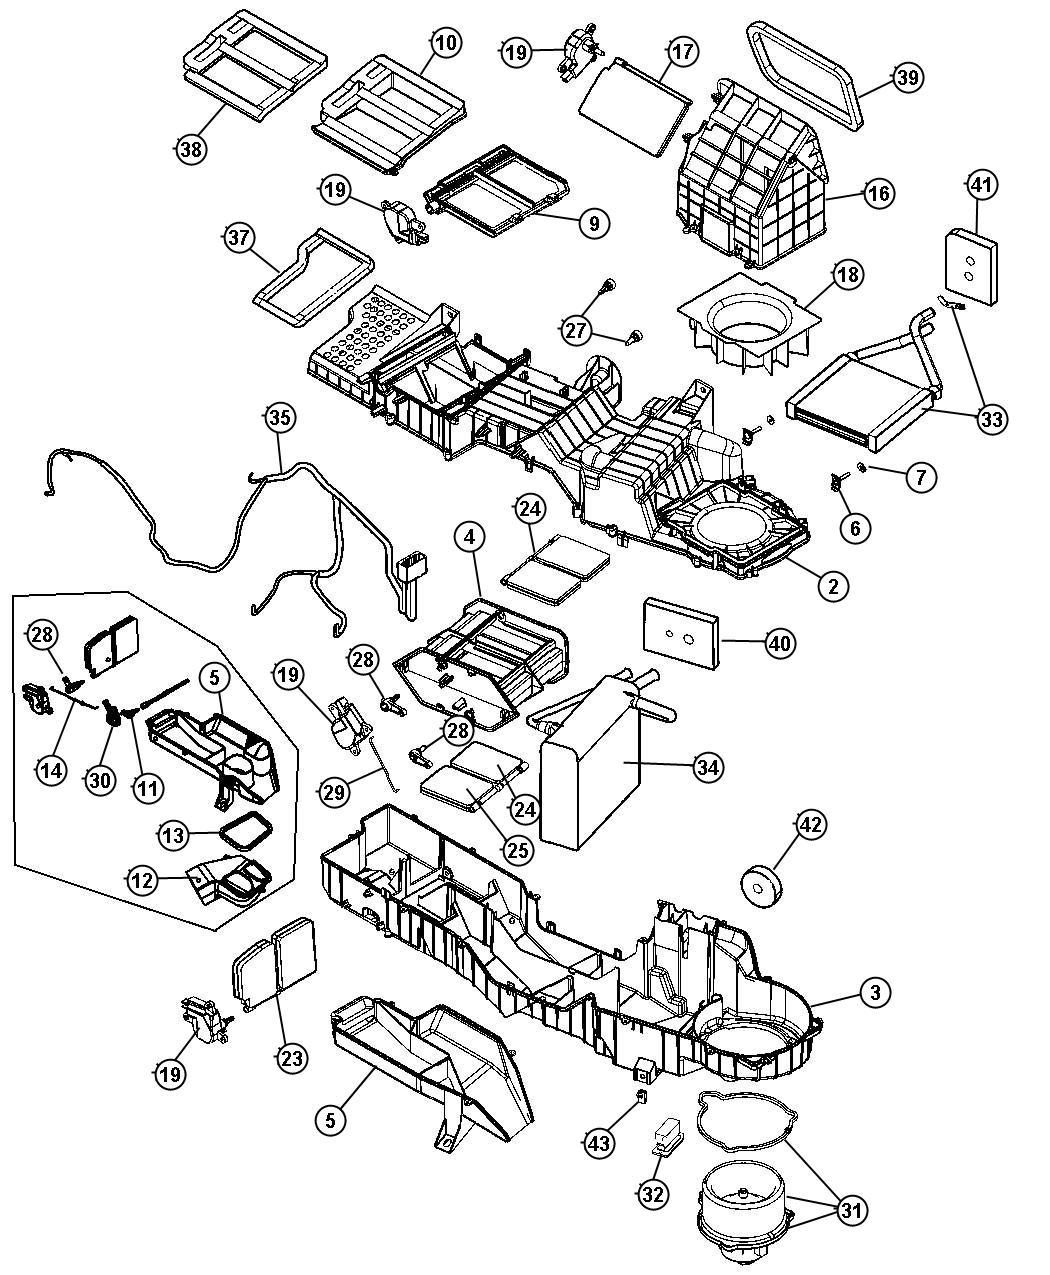 2007 Dodge Ram 1500 Evaporator kit. Air conditioning